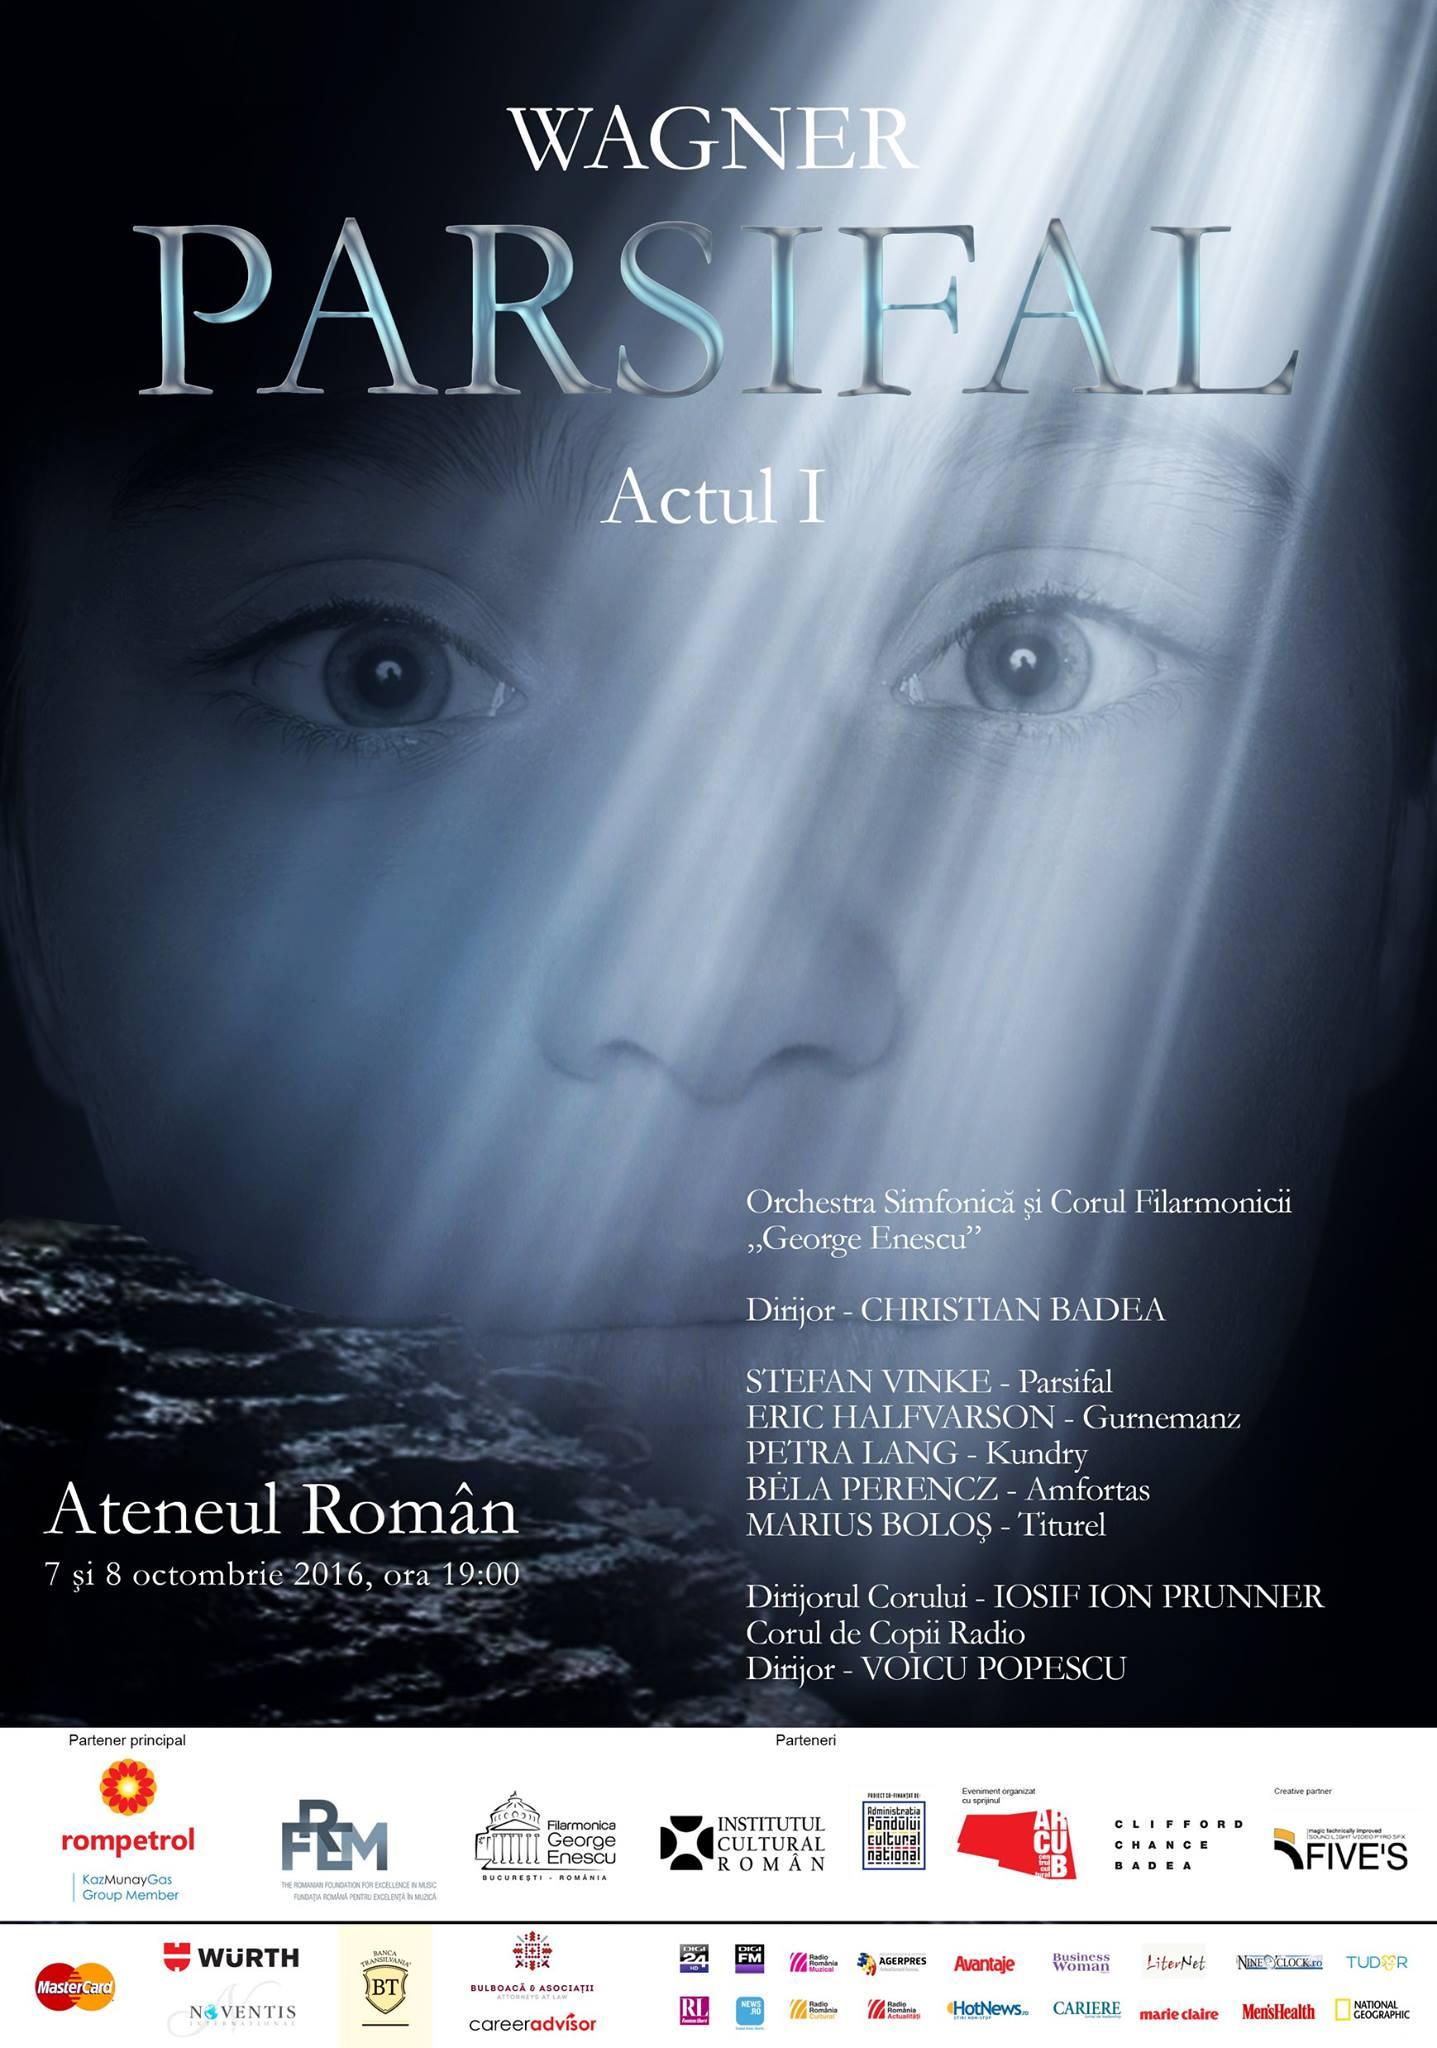 parsifal_wagner_christian-badea